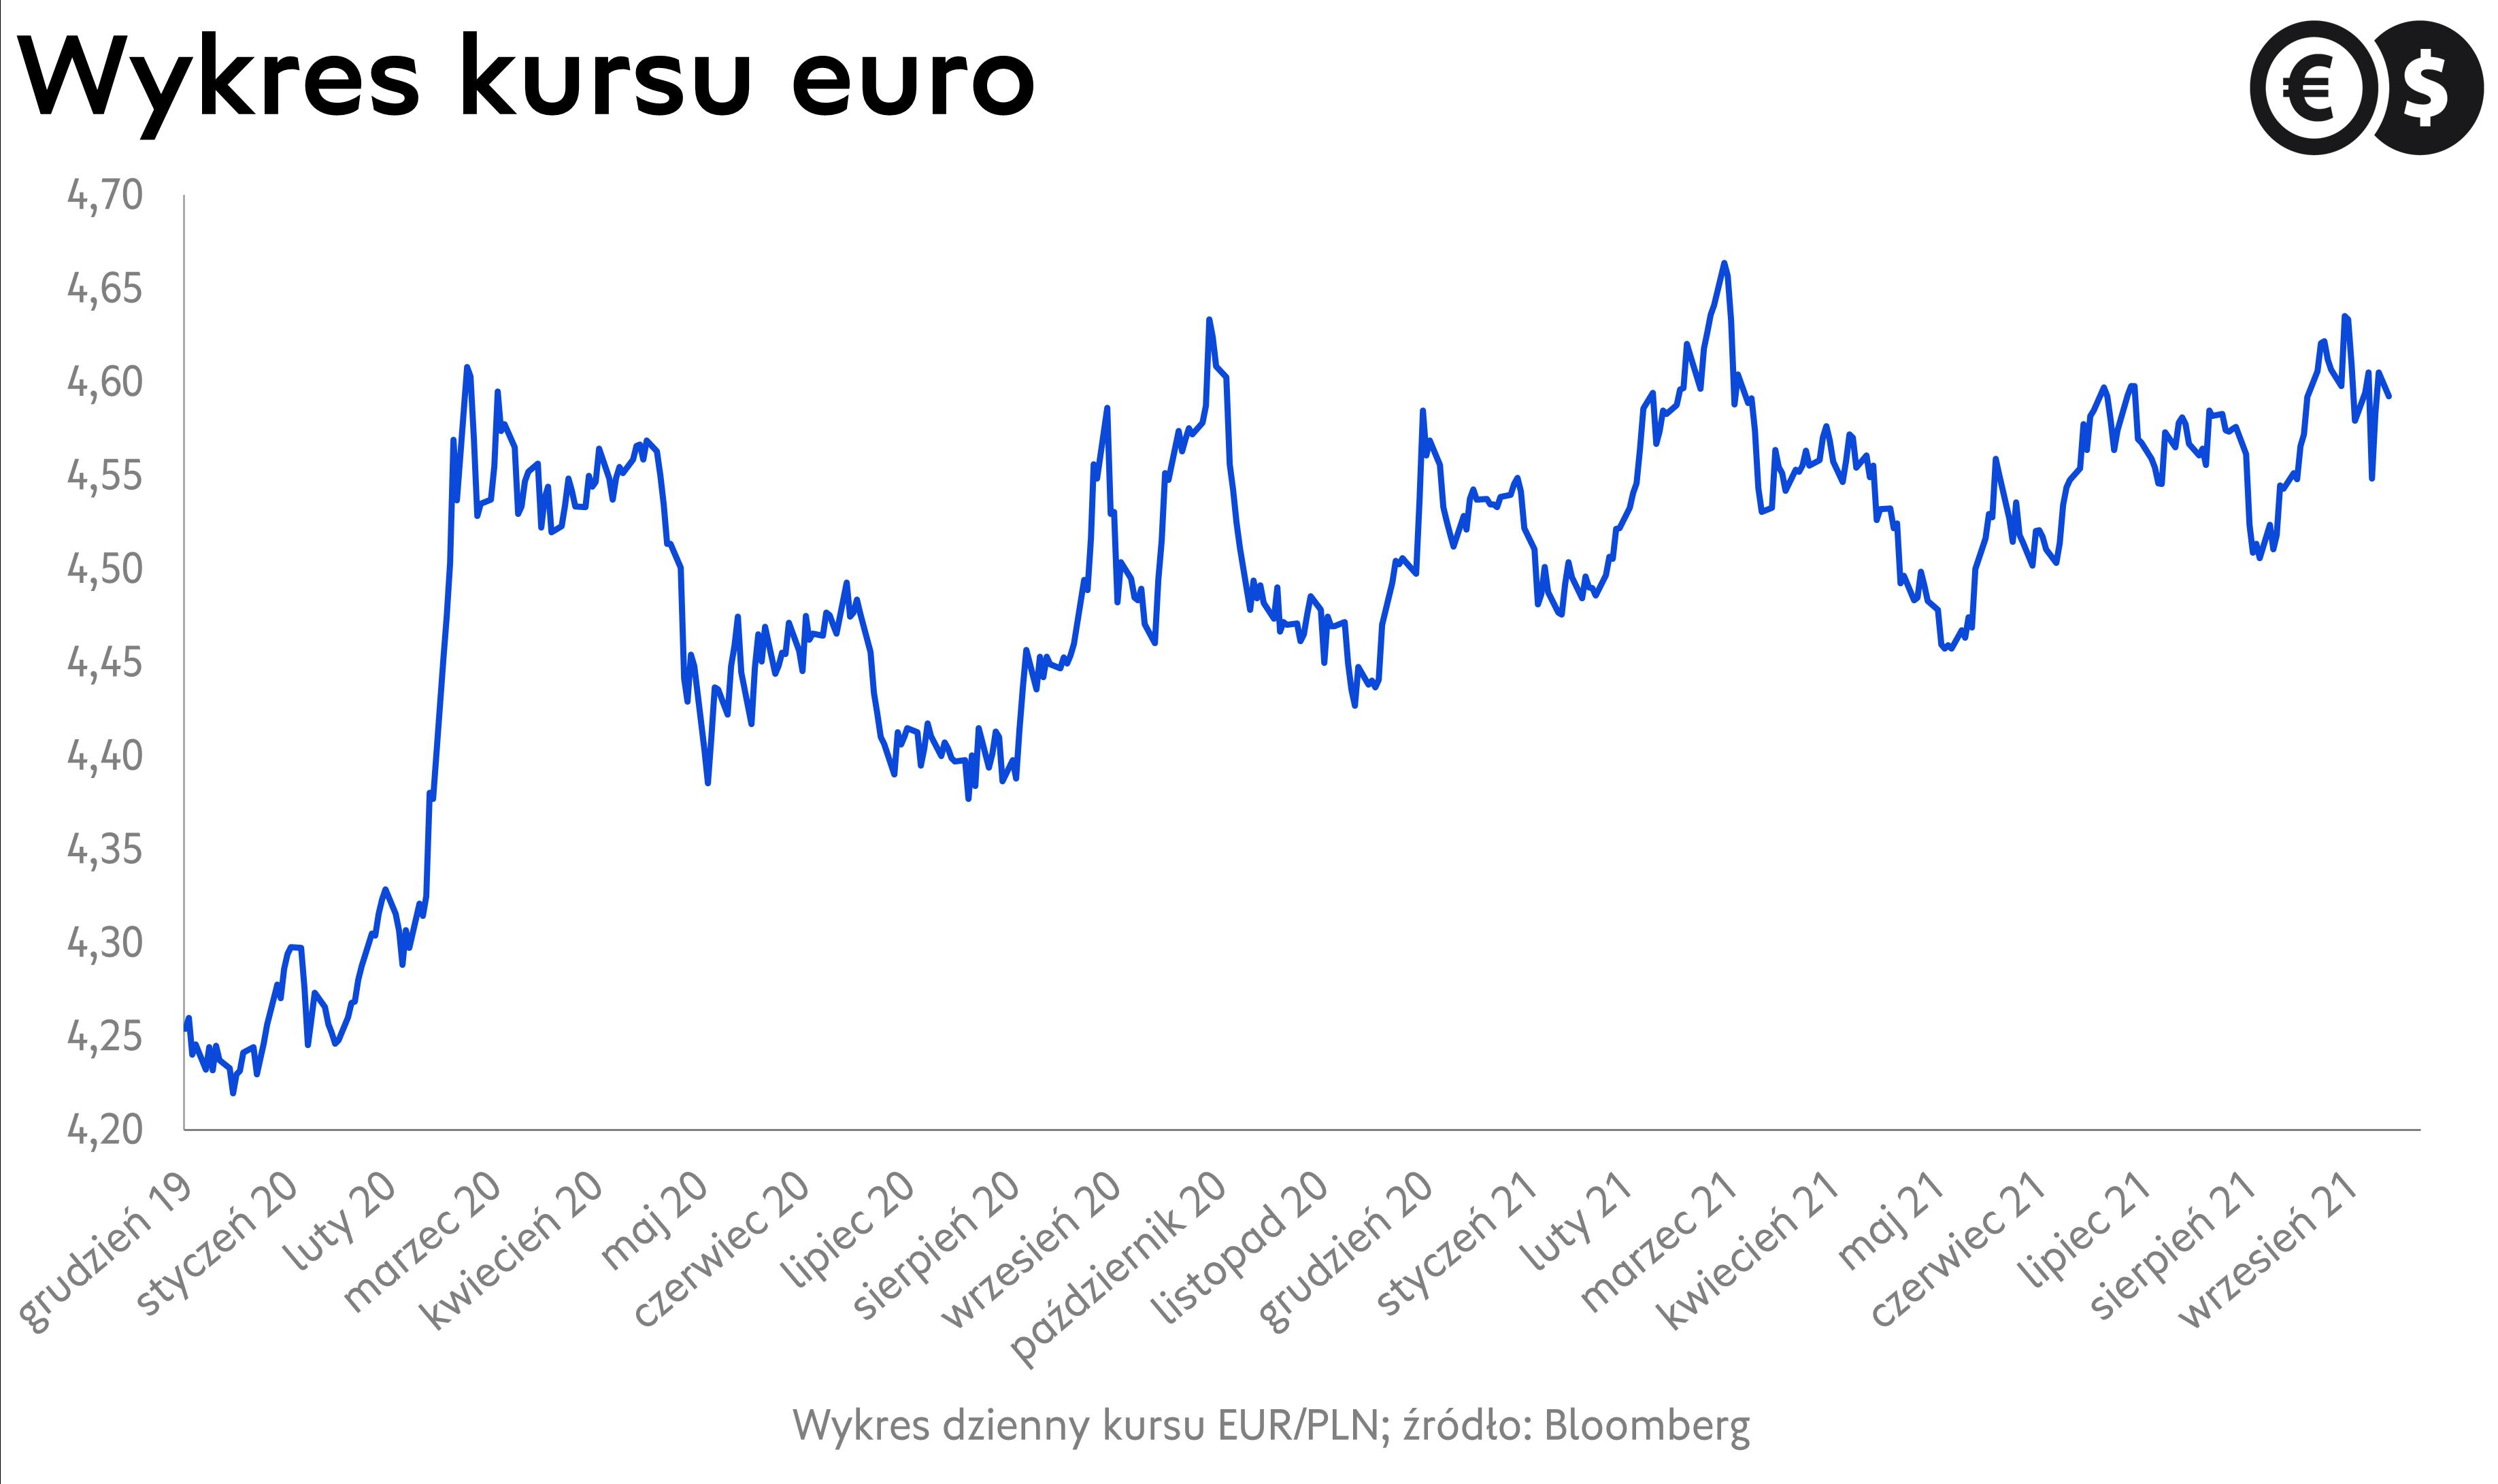 Kurs euro, wykres EUR/PLN, źródło: Bloomberg